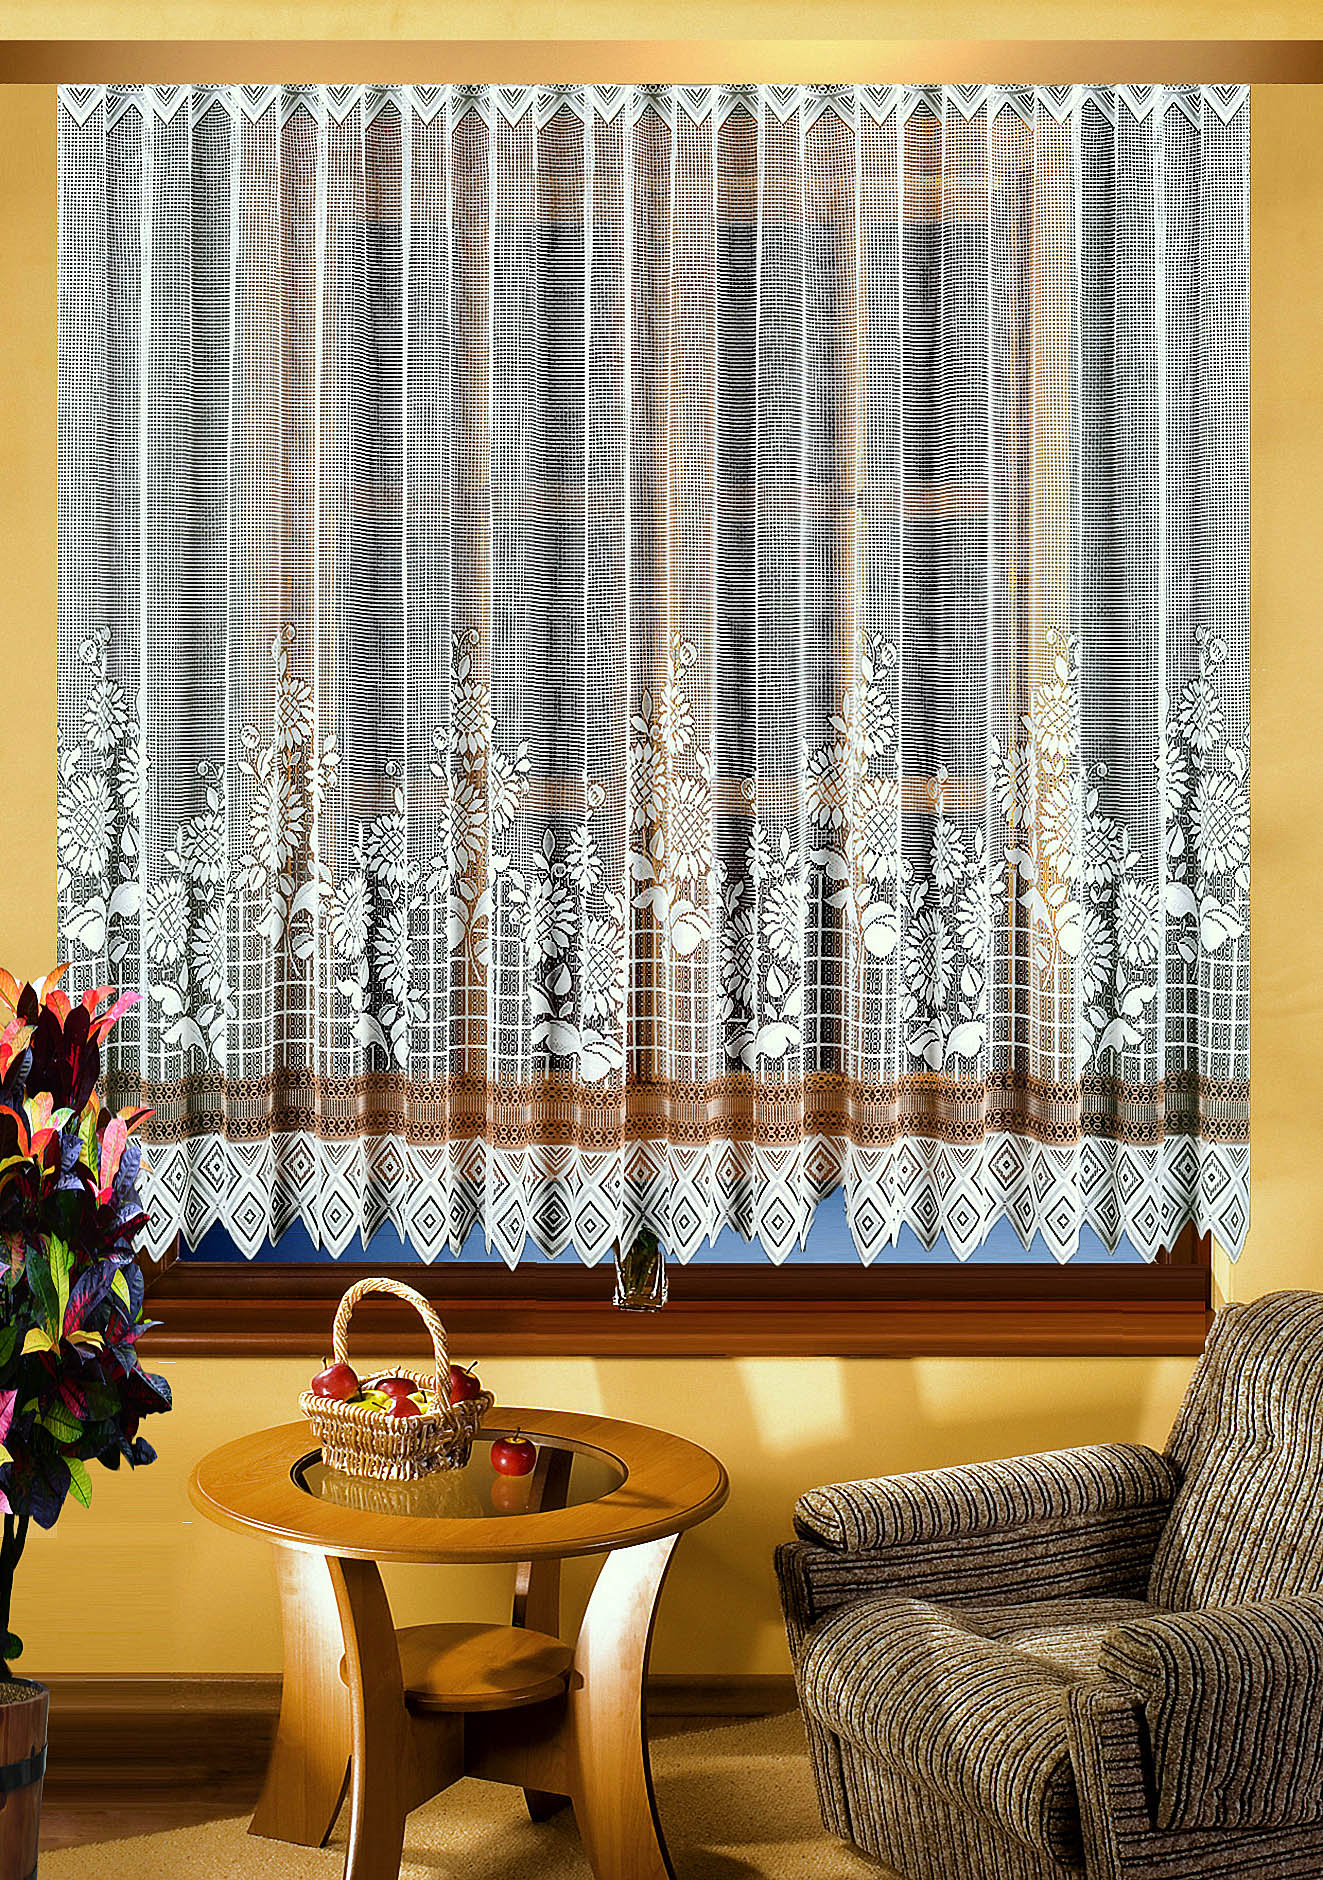 Шторы Elegante Классические шторы Gardinochki Цвет: Белый, Крем шторы elegante классические шторы туман цвет персиковый